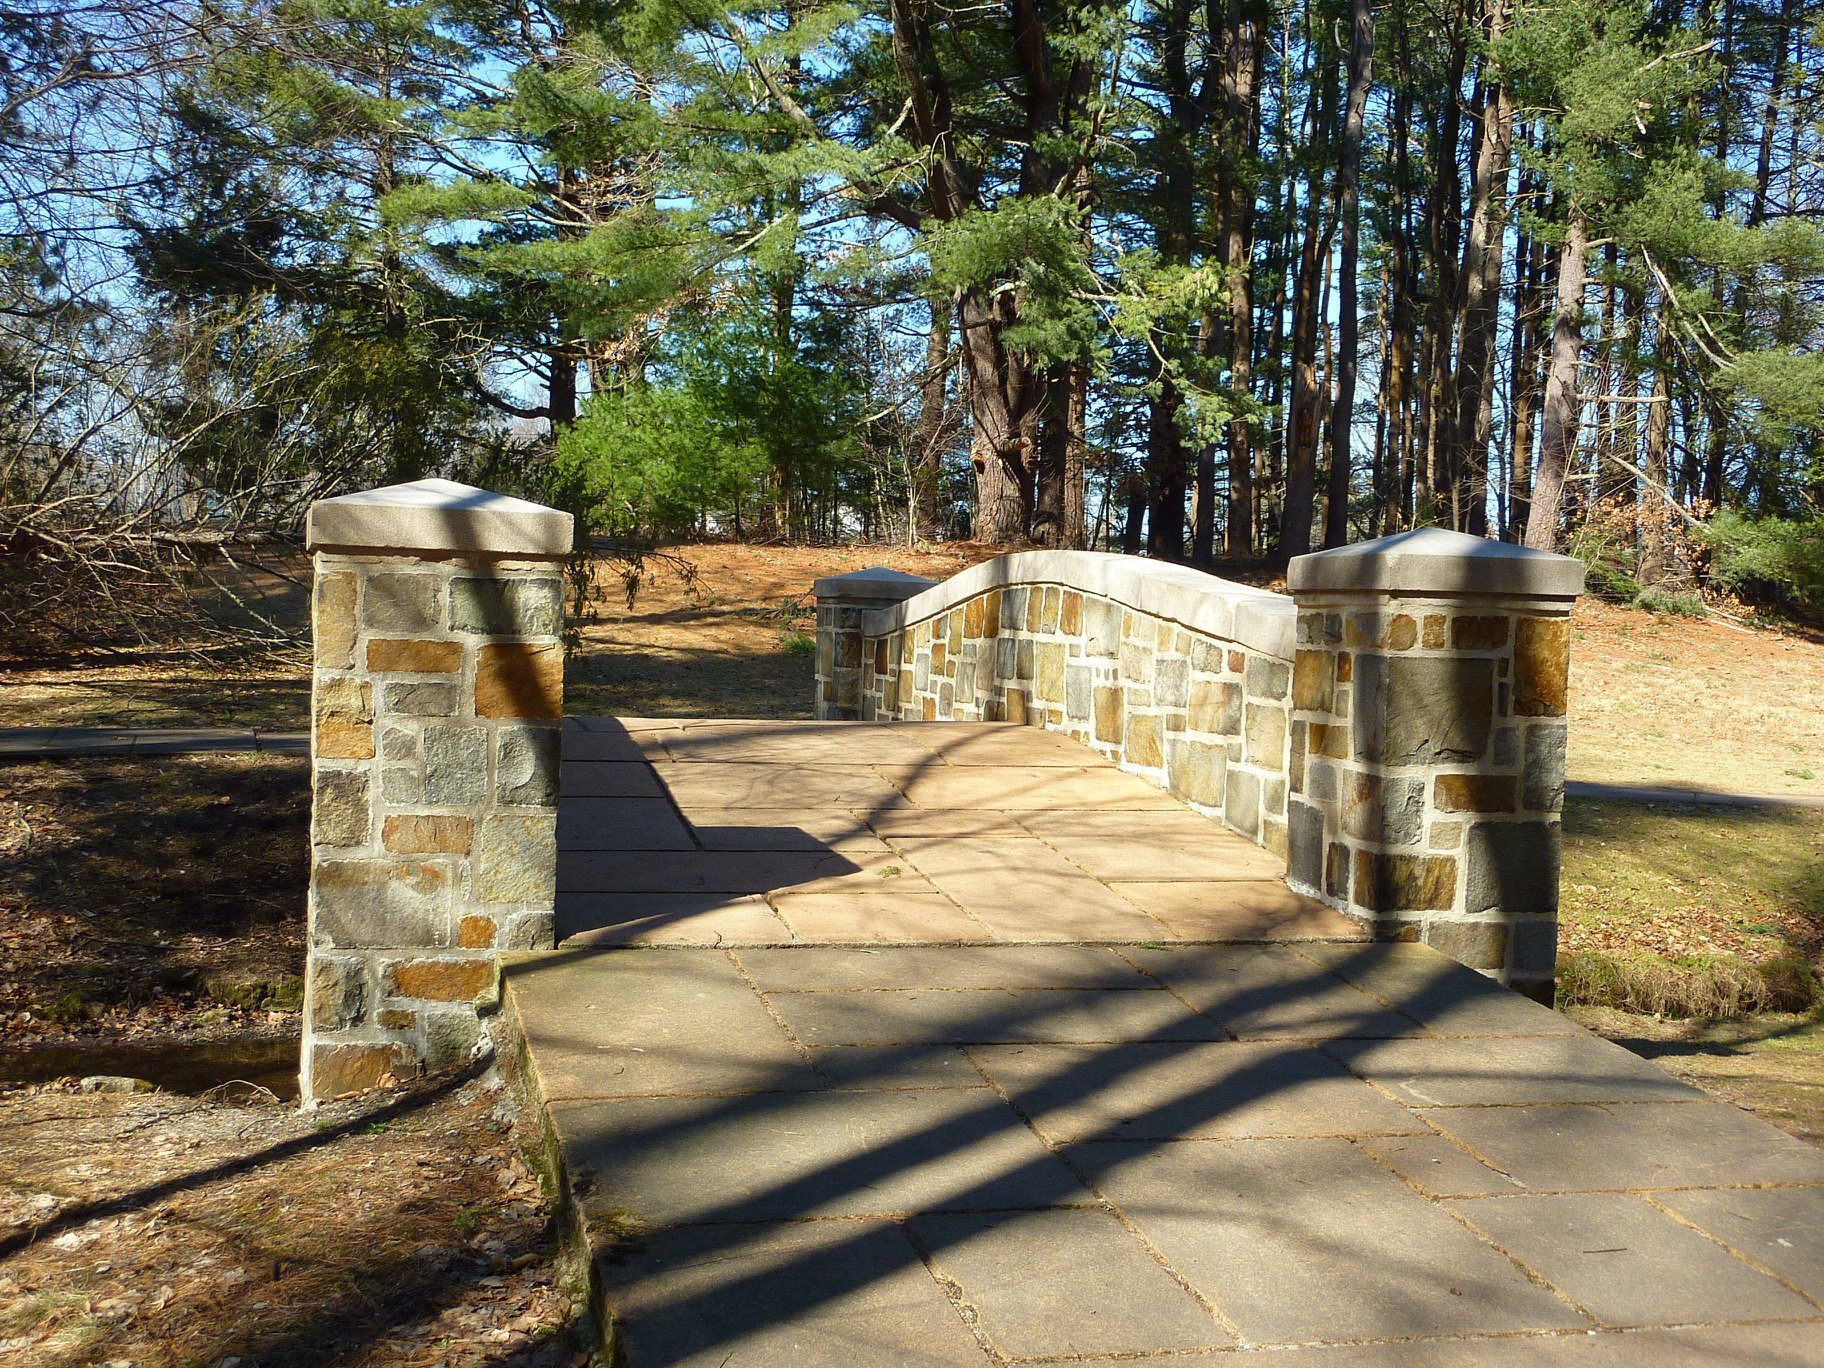 Walking bridge at Bird Park in East Walpole, MA.